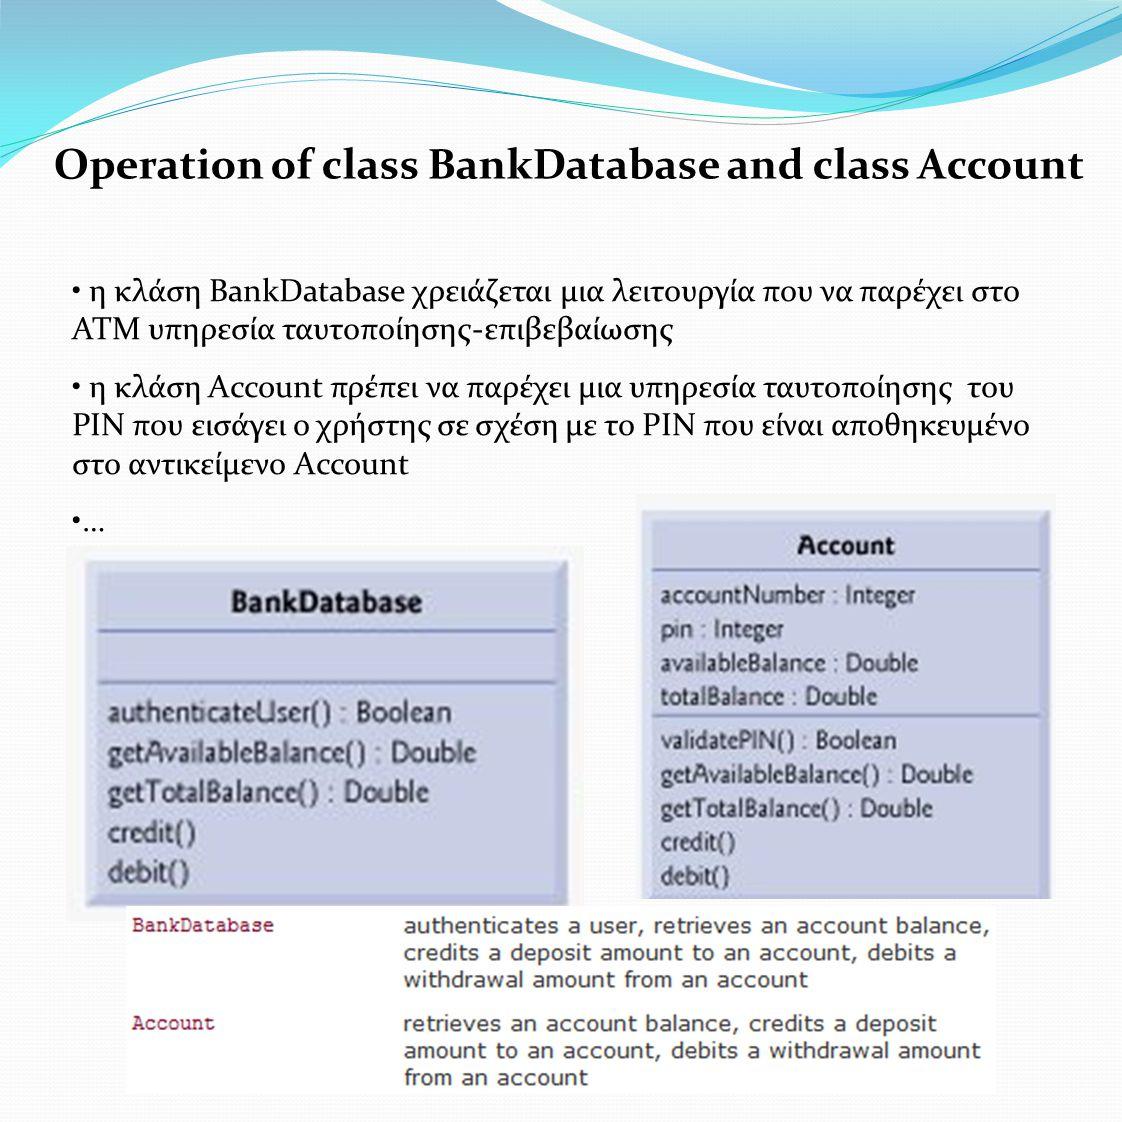 Operation of class BankDatabase and class Account • η κλάση BankDatabase χρειάζεται μια λειτουργία που να παρέχει στο ΑΤΜ υπηρεσία ταυτοποίησης-επιβεβαίωσης • η κλάση Account πρέπει να παρέχει μια υπηρεσία ταυτοποίησης του ΡΙΝ που εισάγει ο χρήστης σε σχέση με το PΙΝ που είναι αποθηκευμένο στο αντικείμενο Account •…